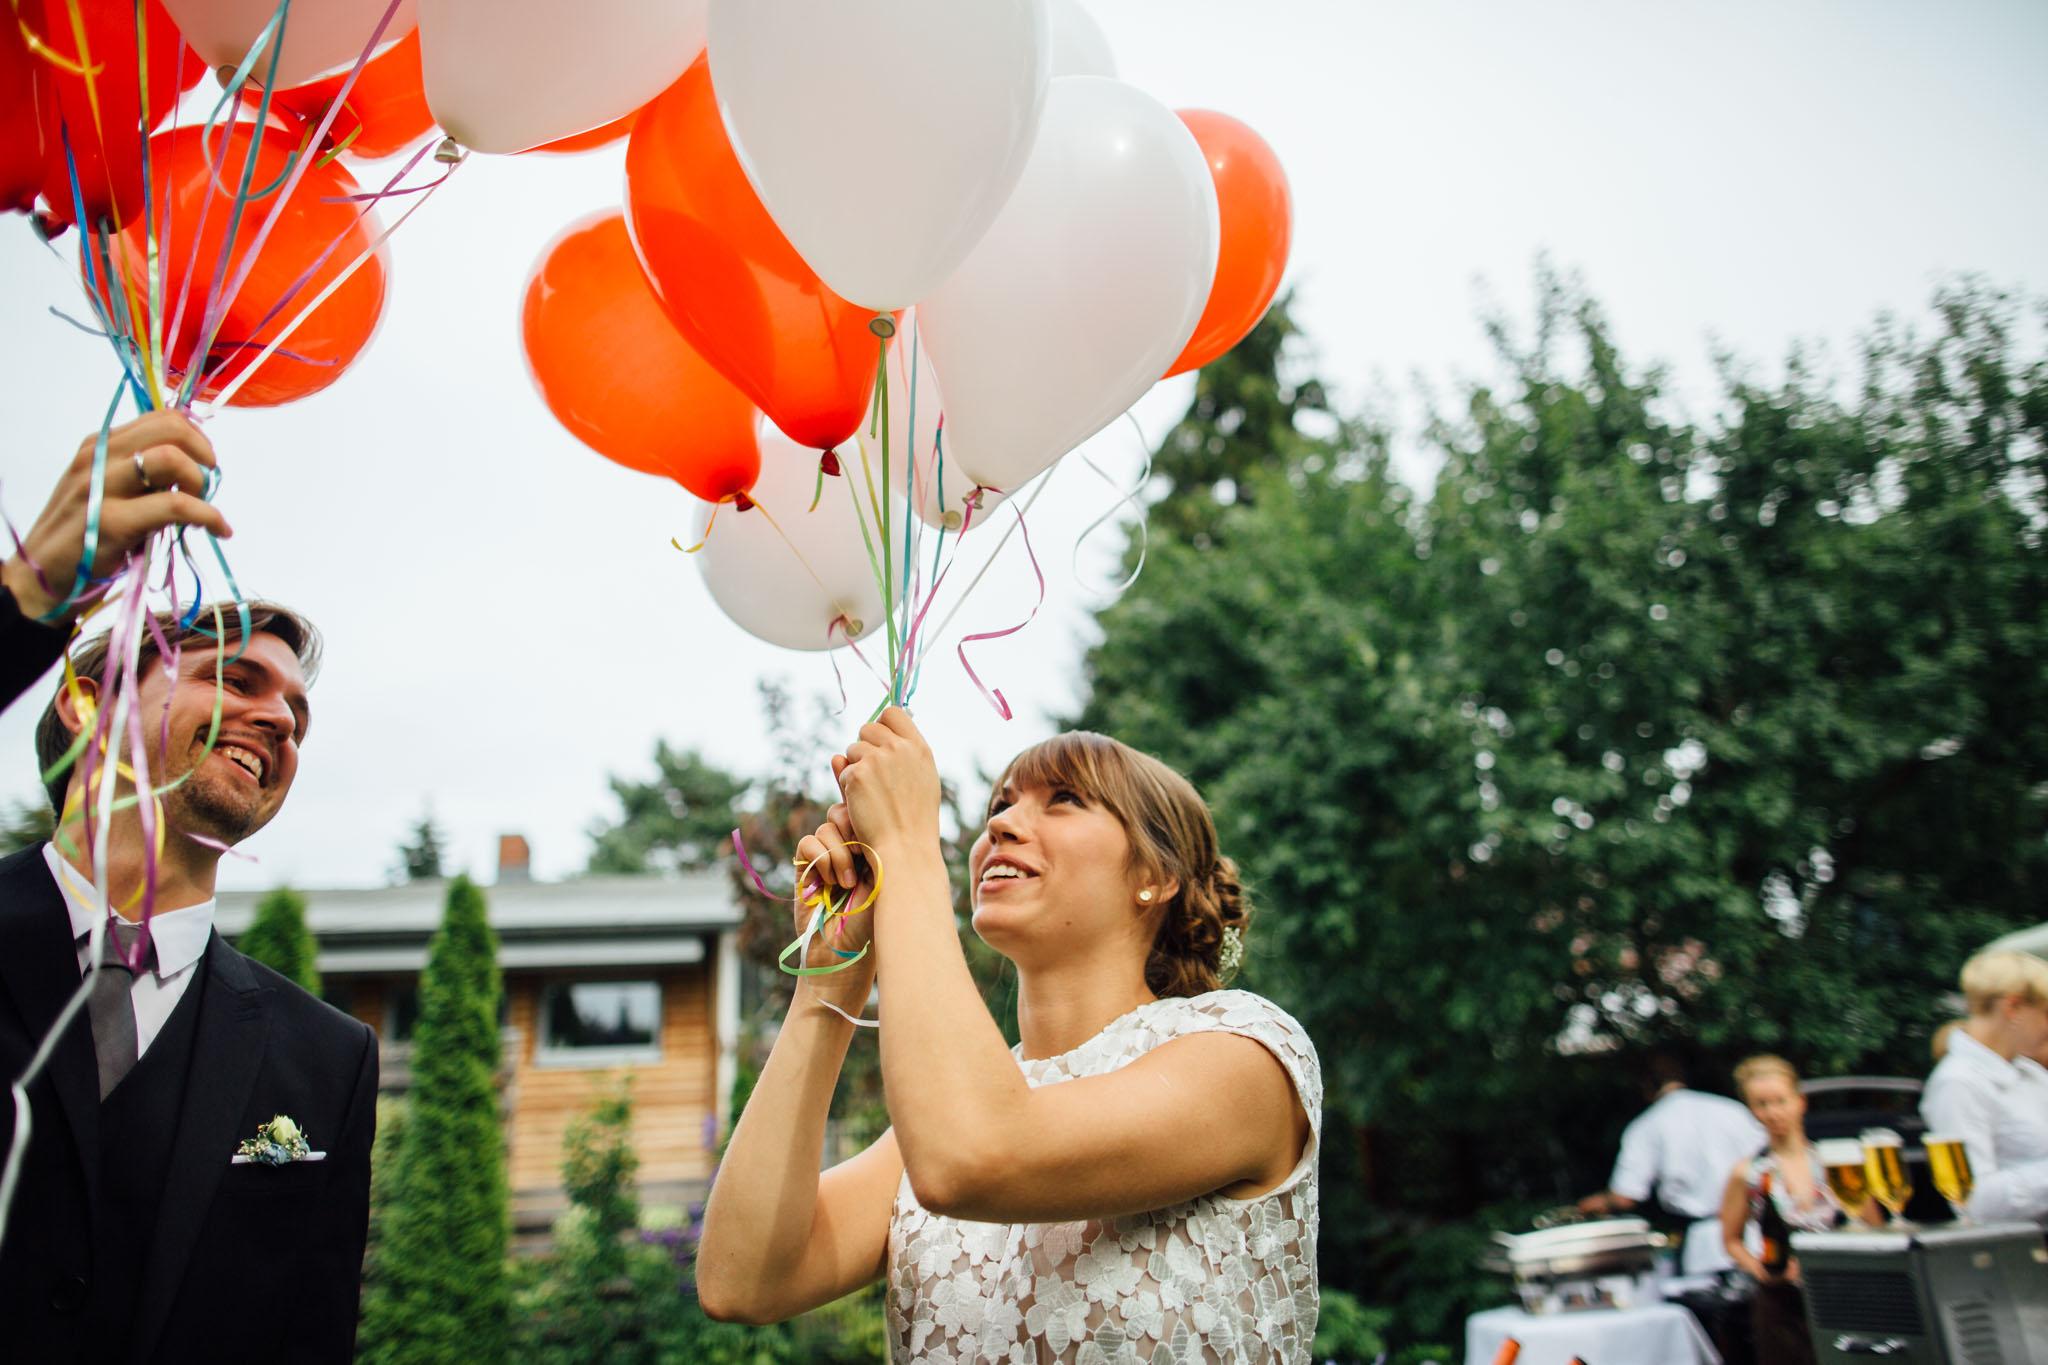 gartenhochzeit-luftballons-berlin